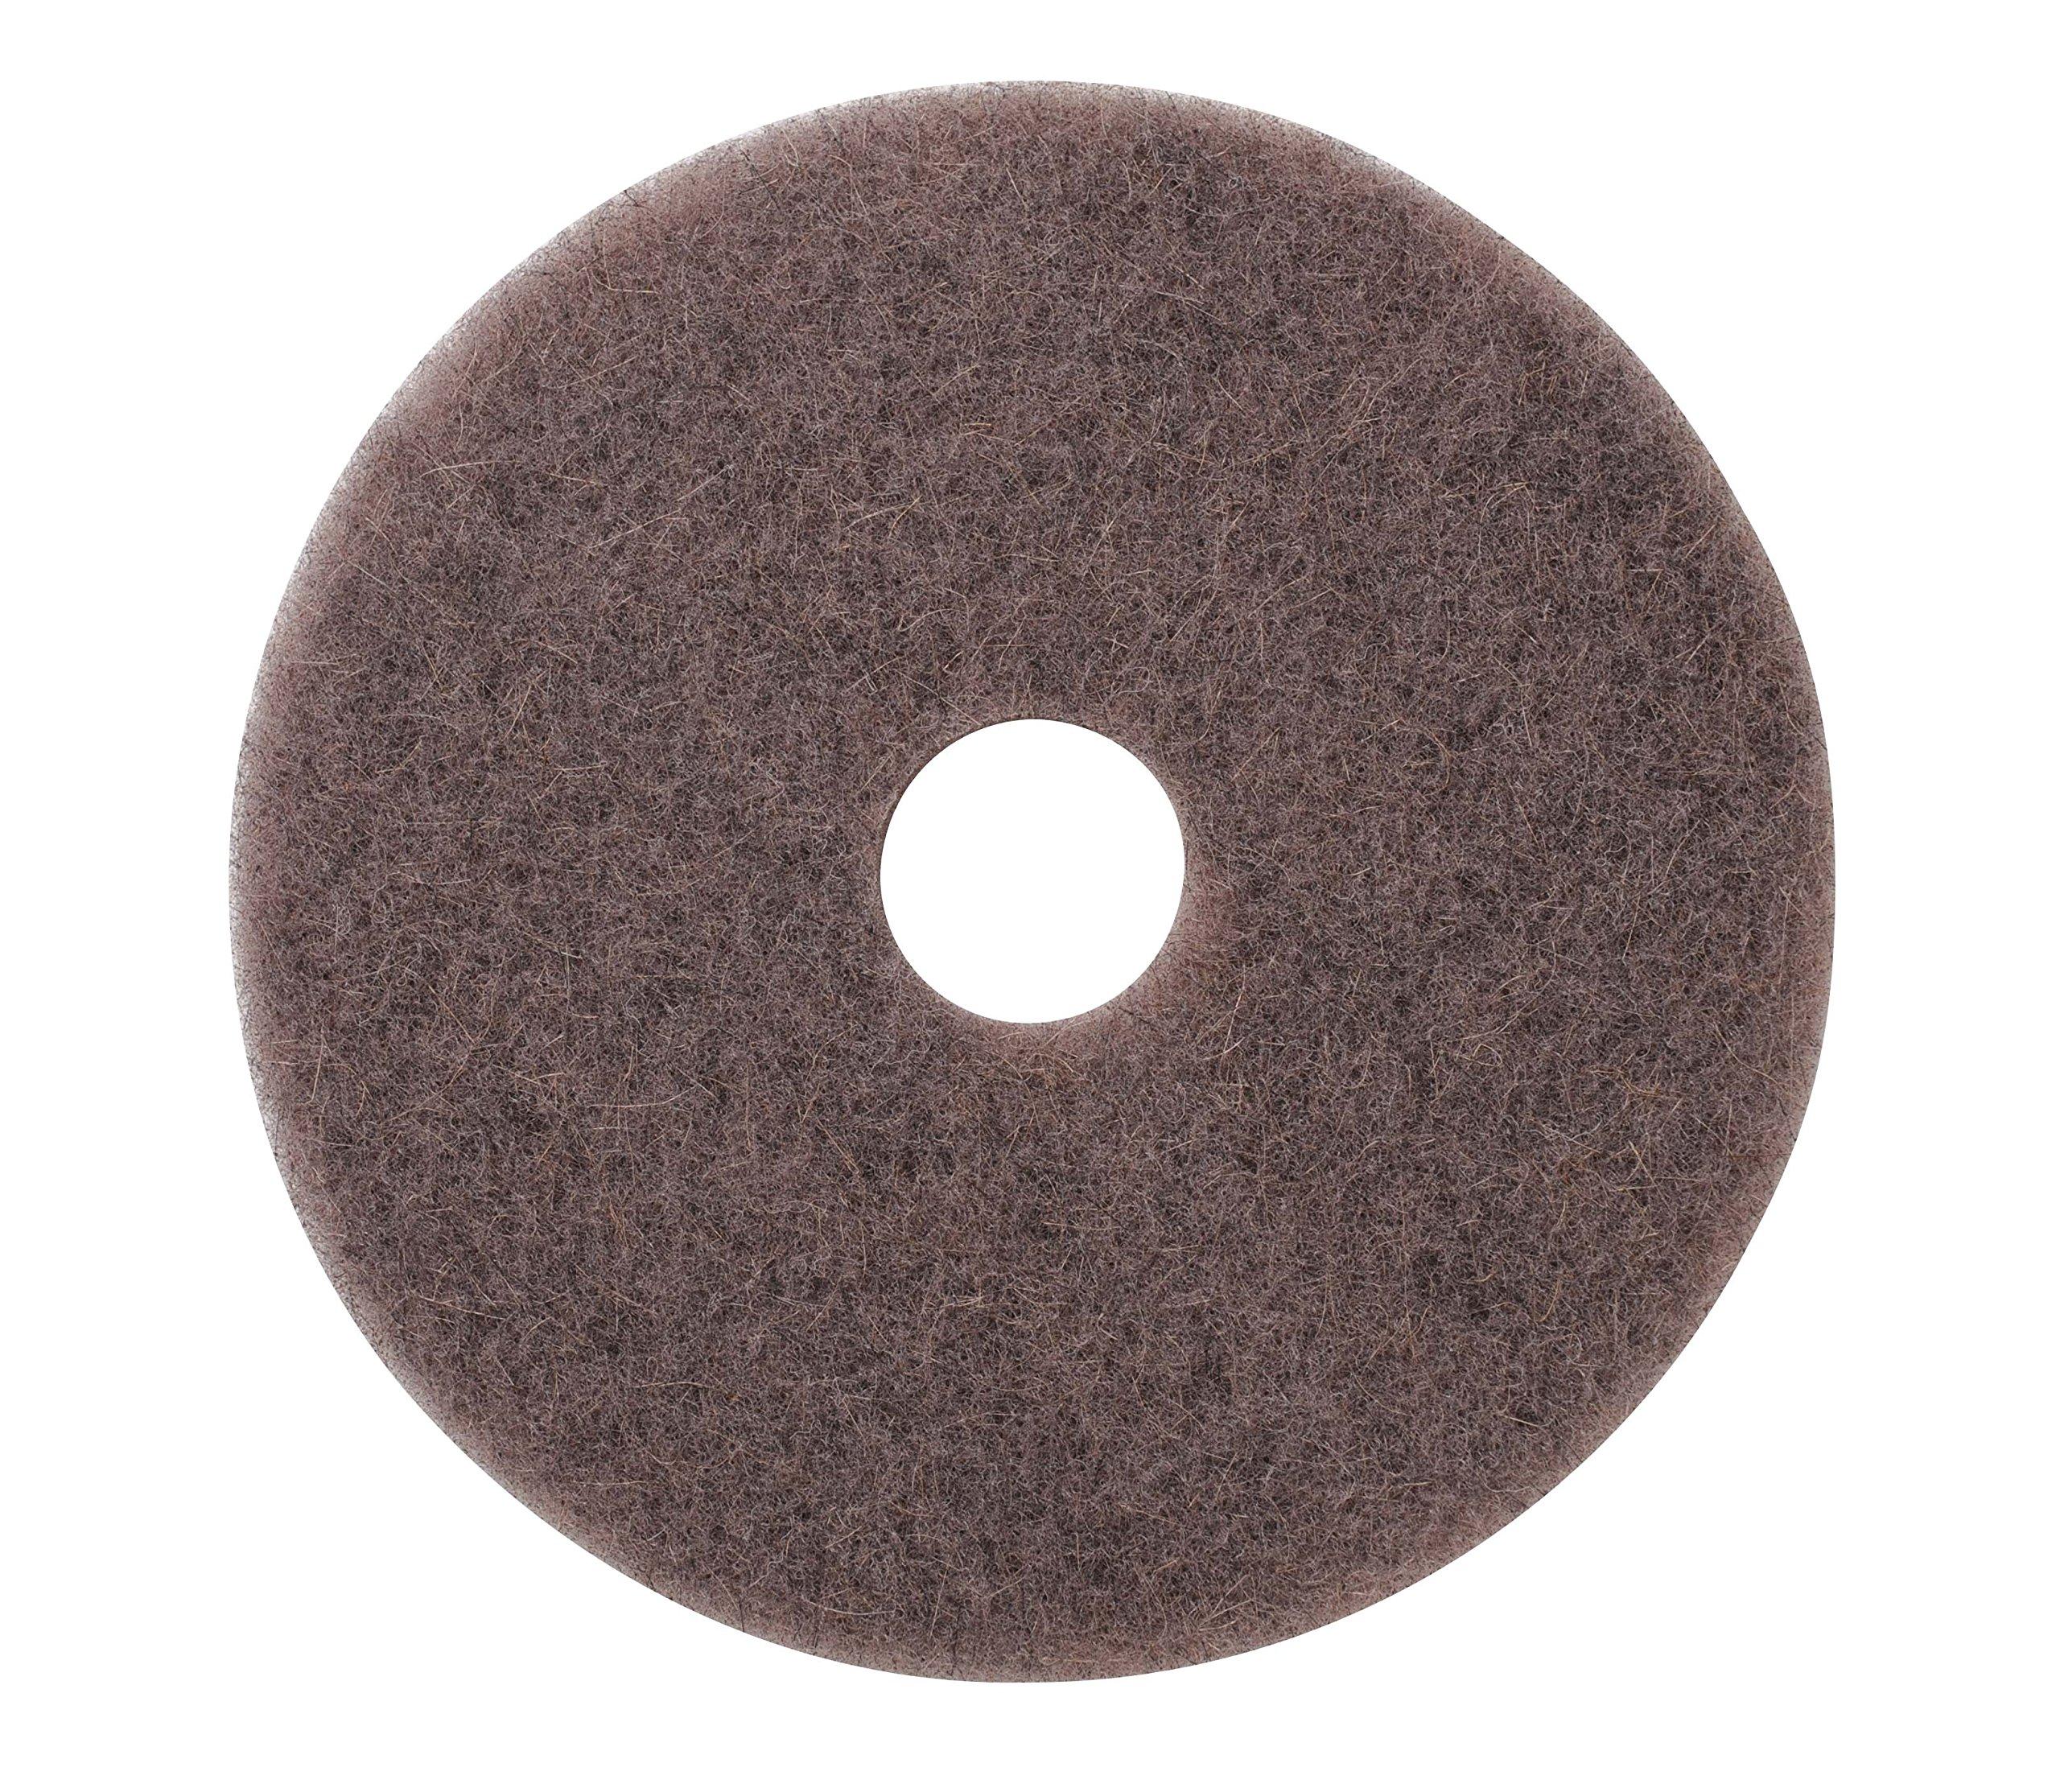 Americo Manufacturing 401721 Porko Natural Ultra High Speed Natural Fiber Burnishing Floor Pad (5 Pack), 21''